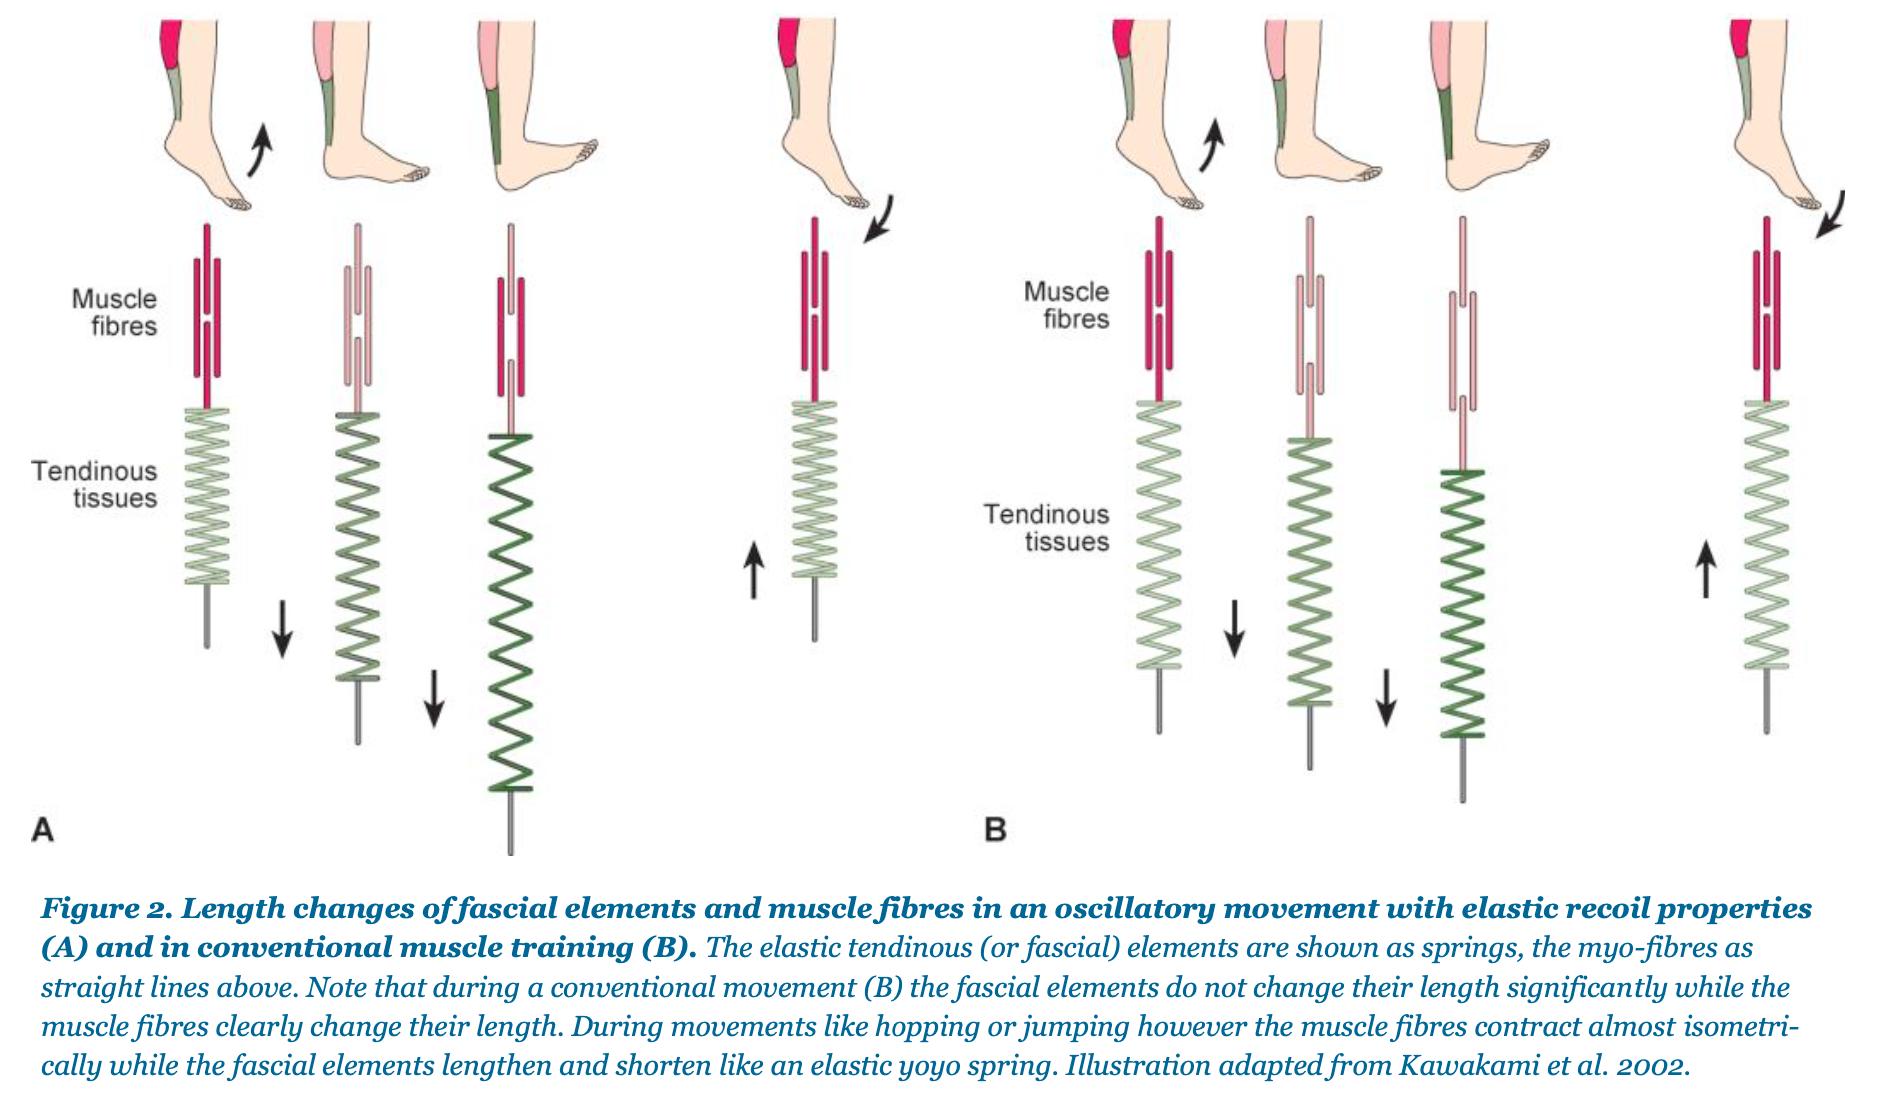 The Catapult Mechanism: Elastic Recoil of Fascial Tissues 2